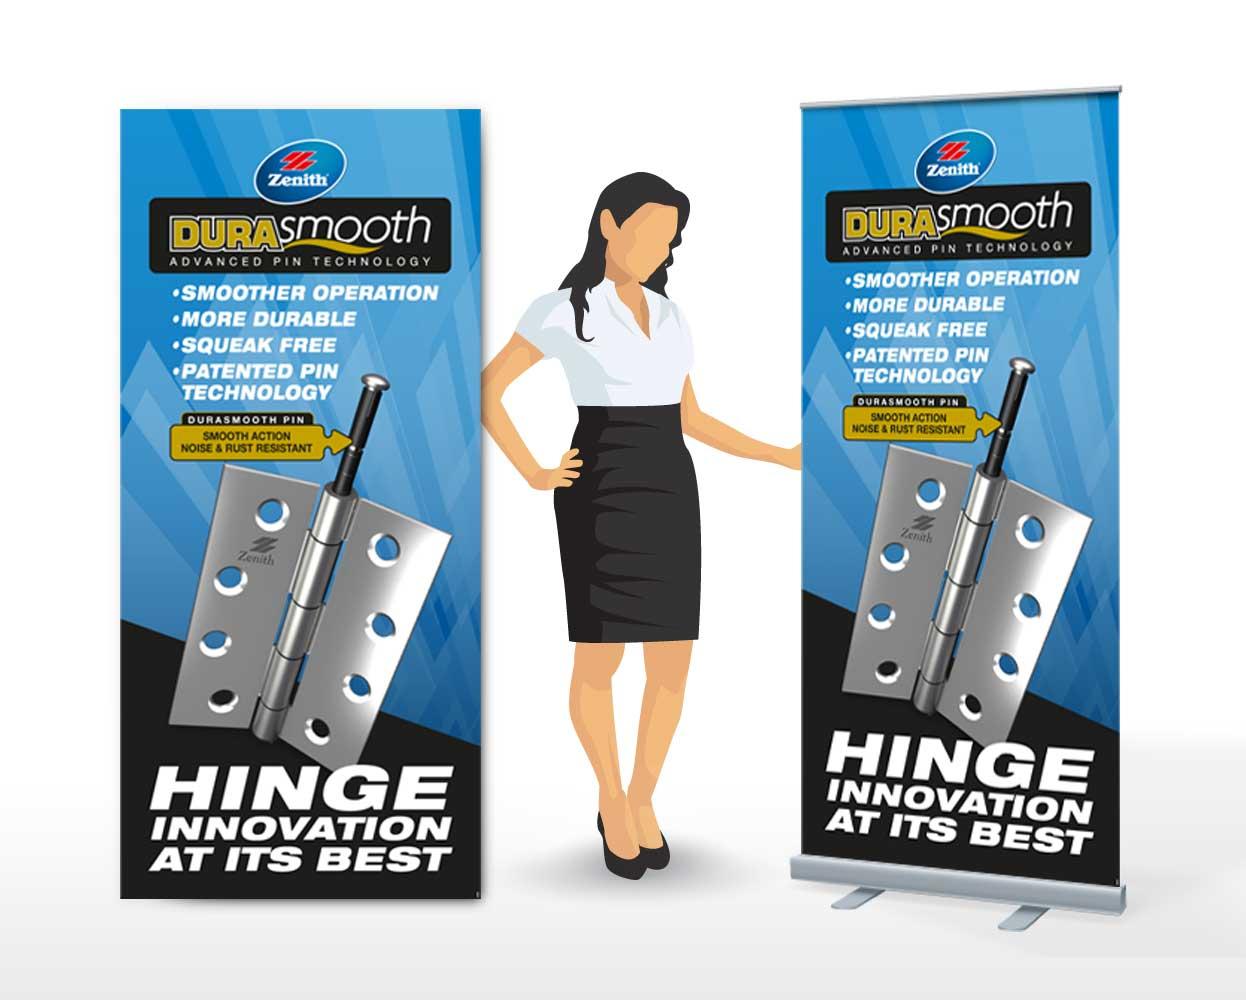 Zenith Durasmooth Packaging Pullup